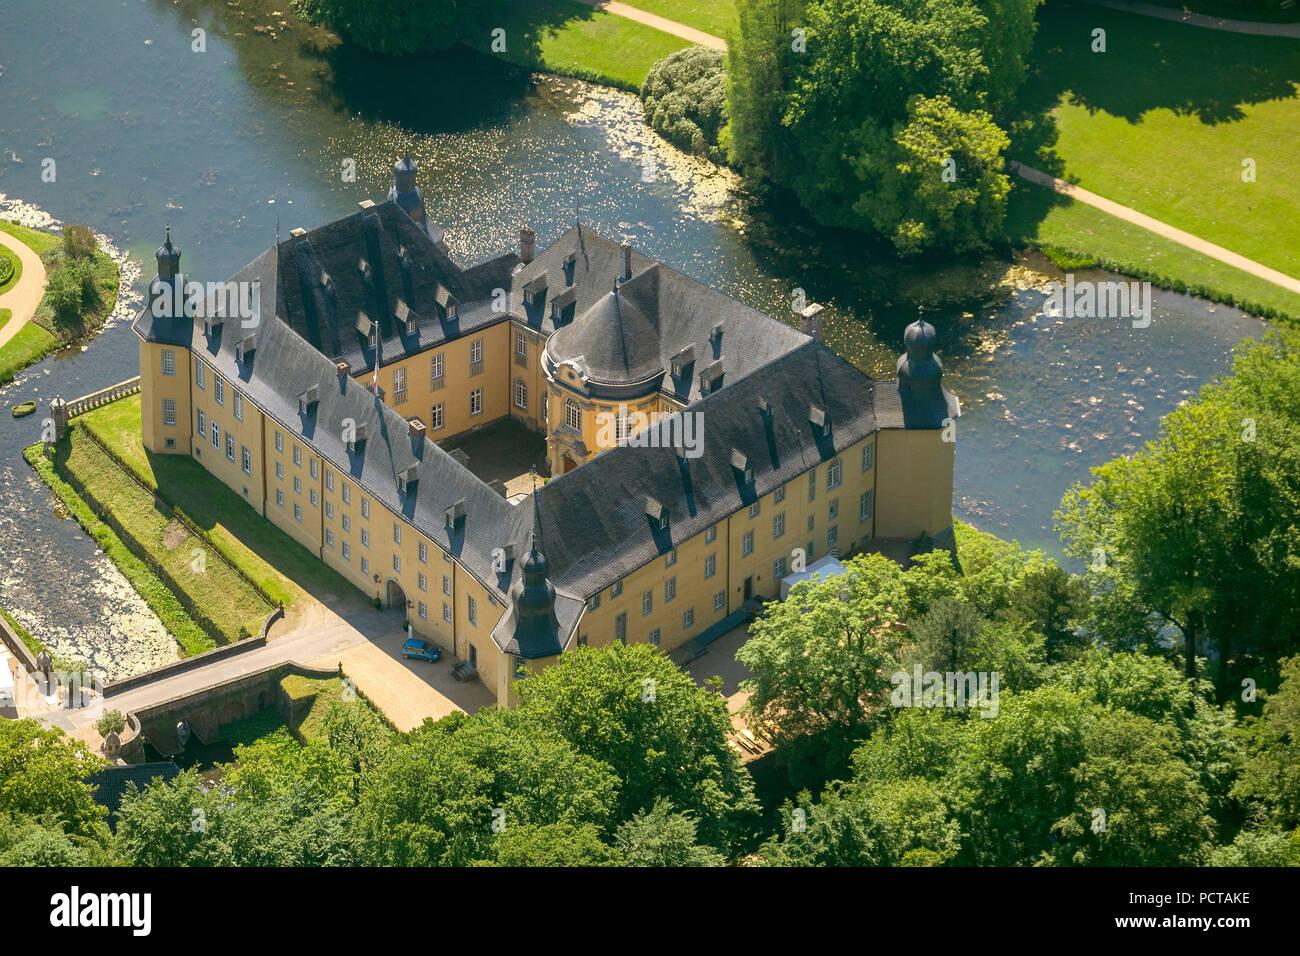 Water castle of Jüchen, Rhineland, two outer baileys, park, English landscape garden, Joseph zu Salm-Reifferscheidt-Dyck, state horticultural show 2002 - Stock Image